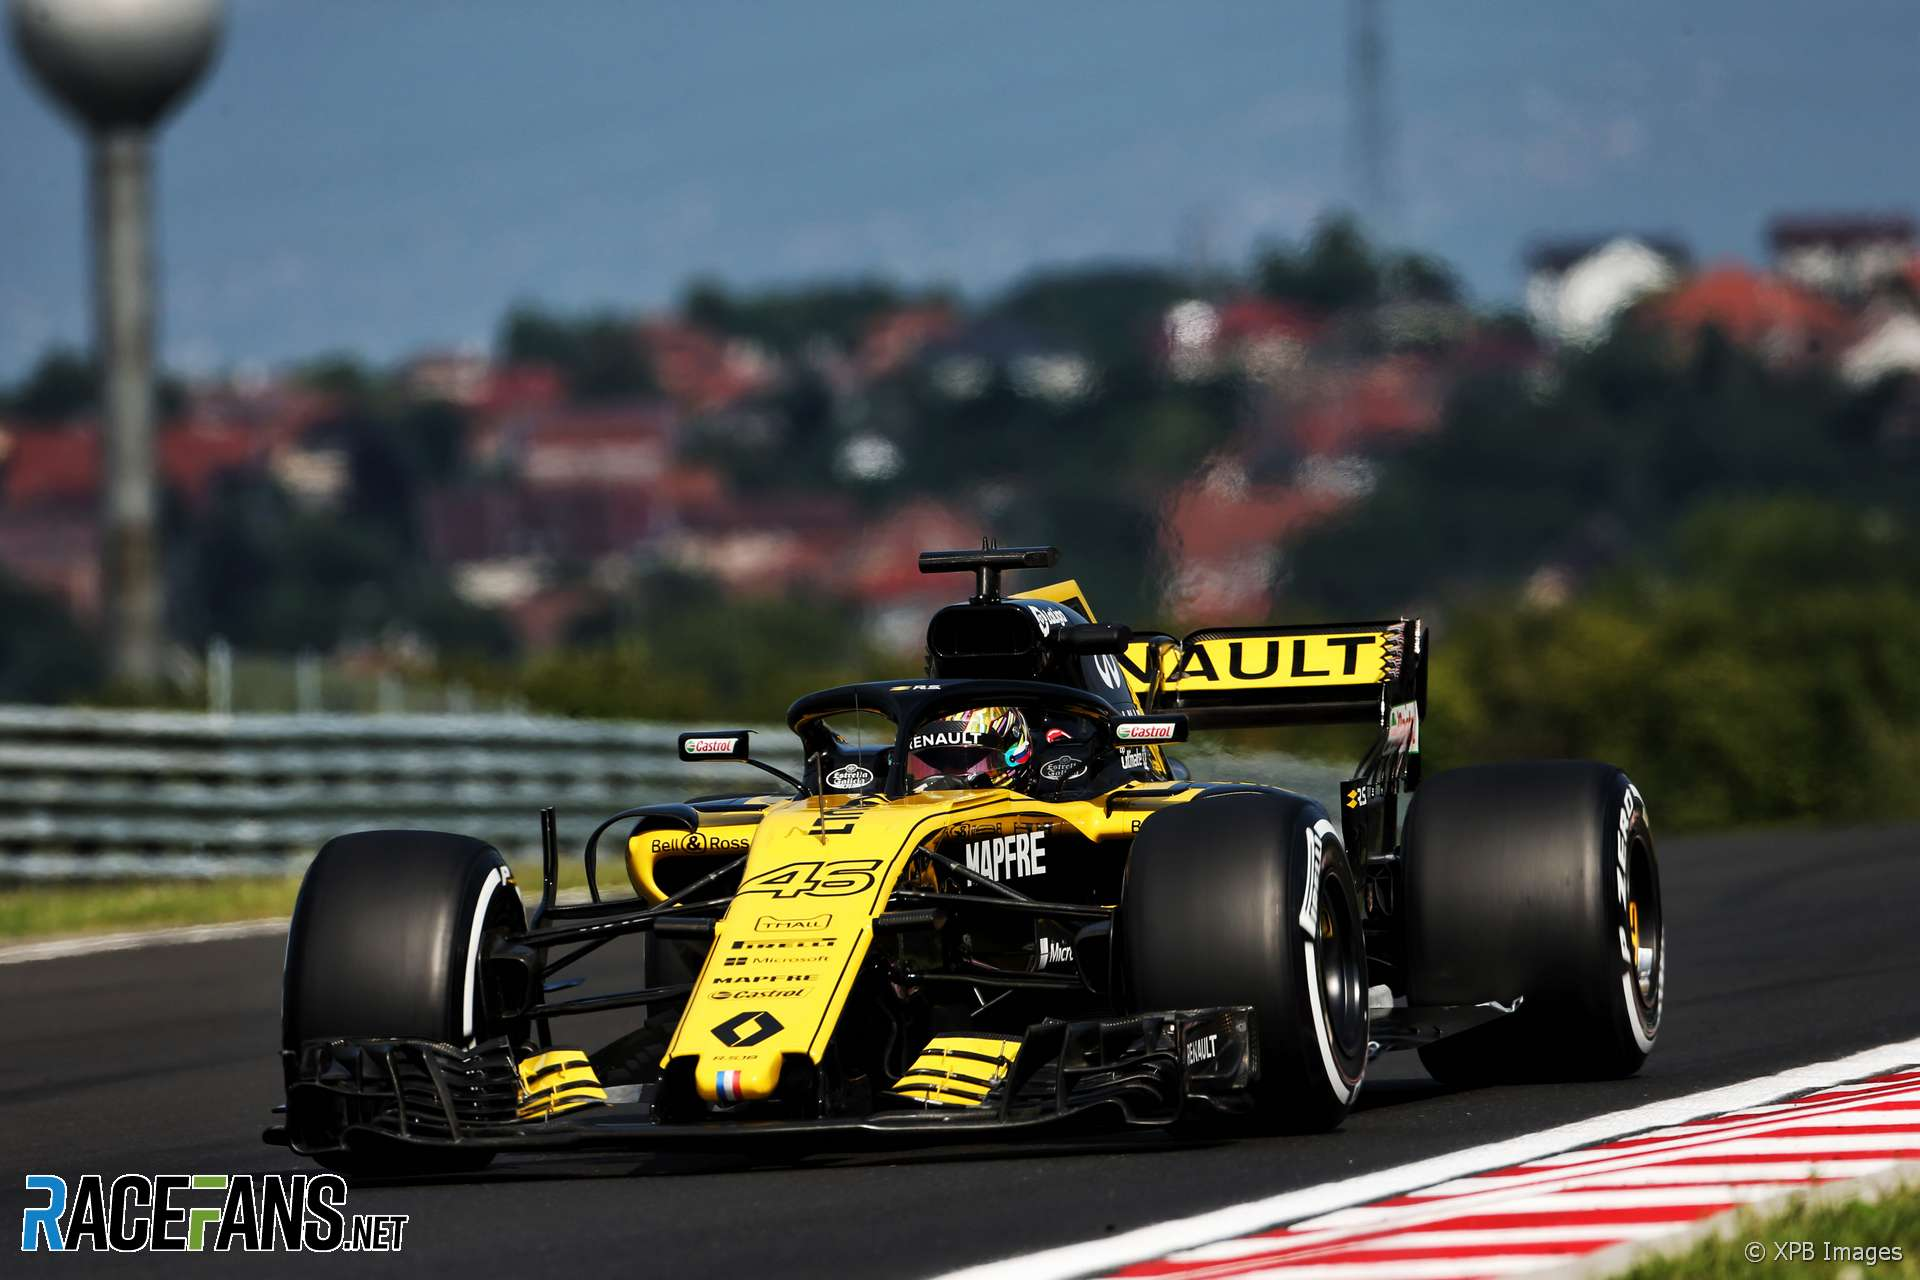 Artem Markelov, Renault, Hungaroring, 2018